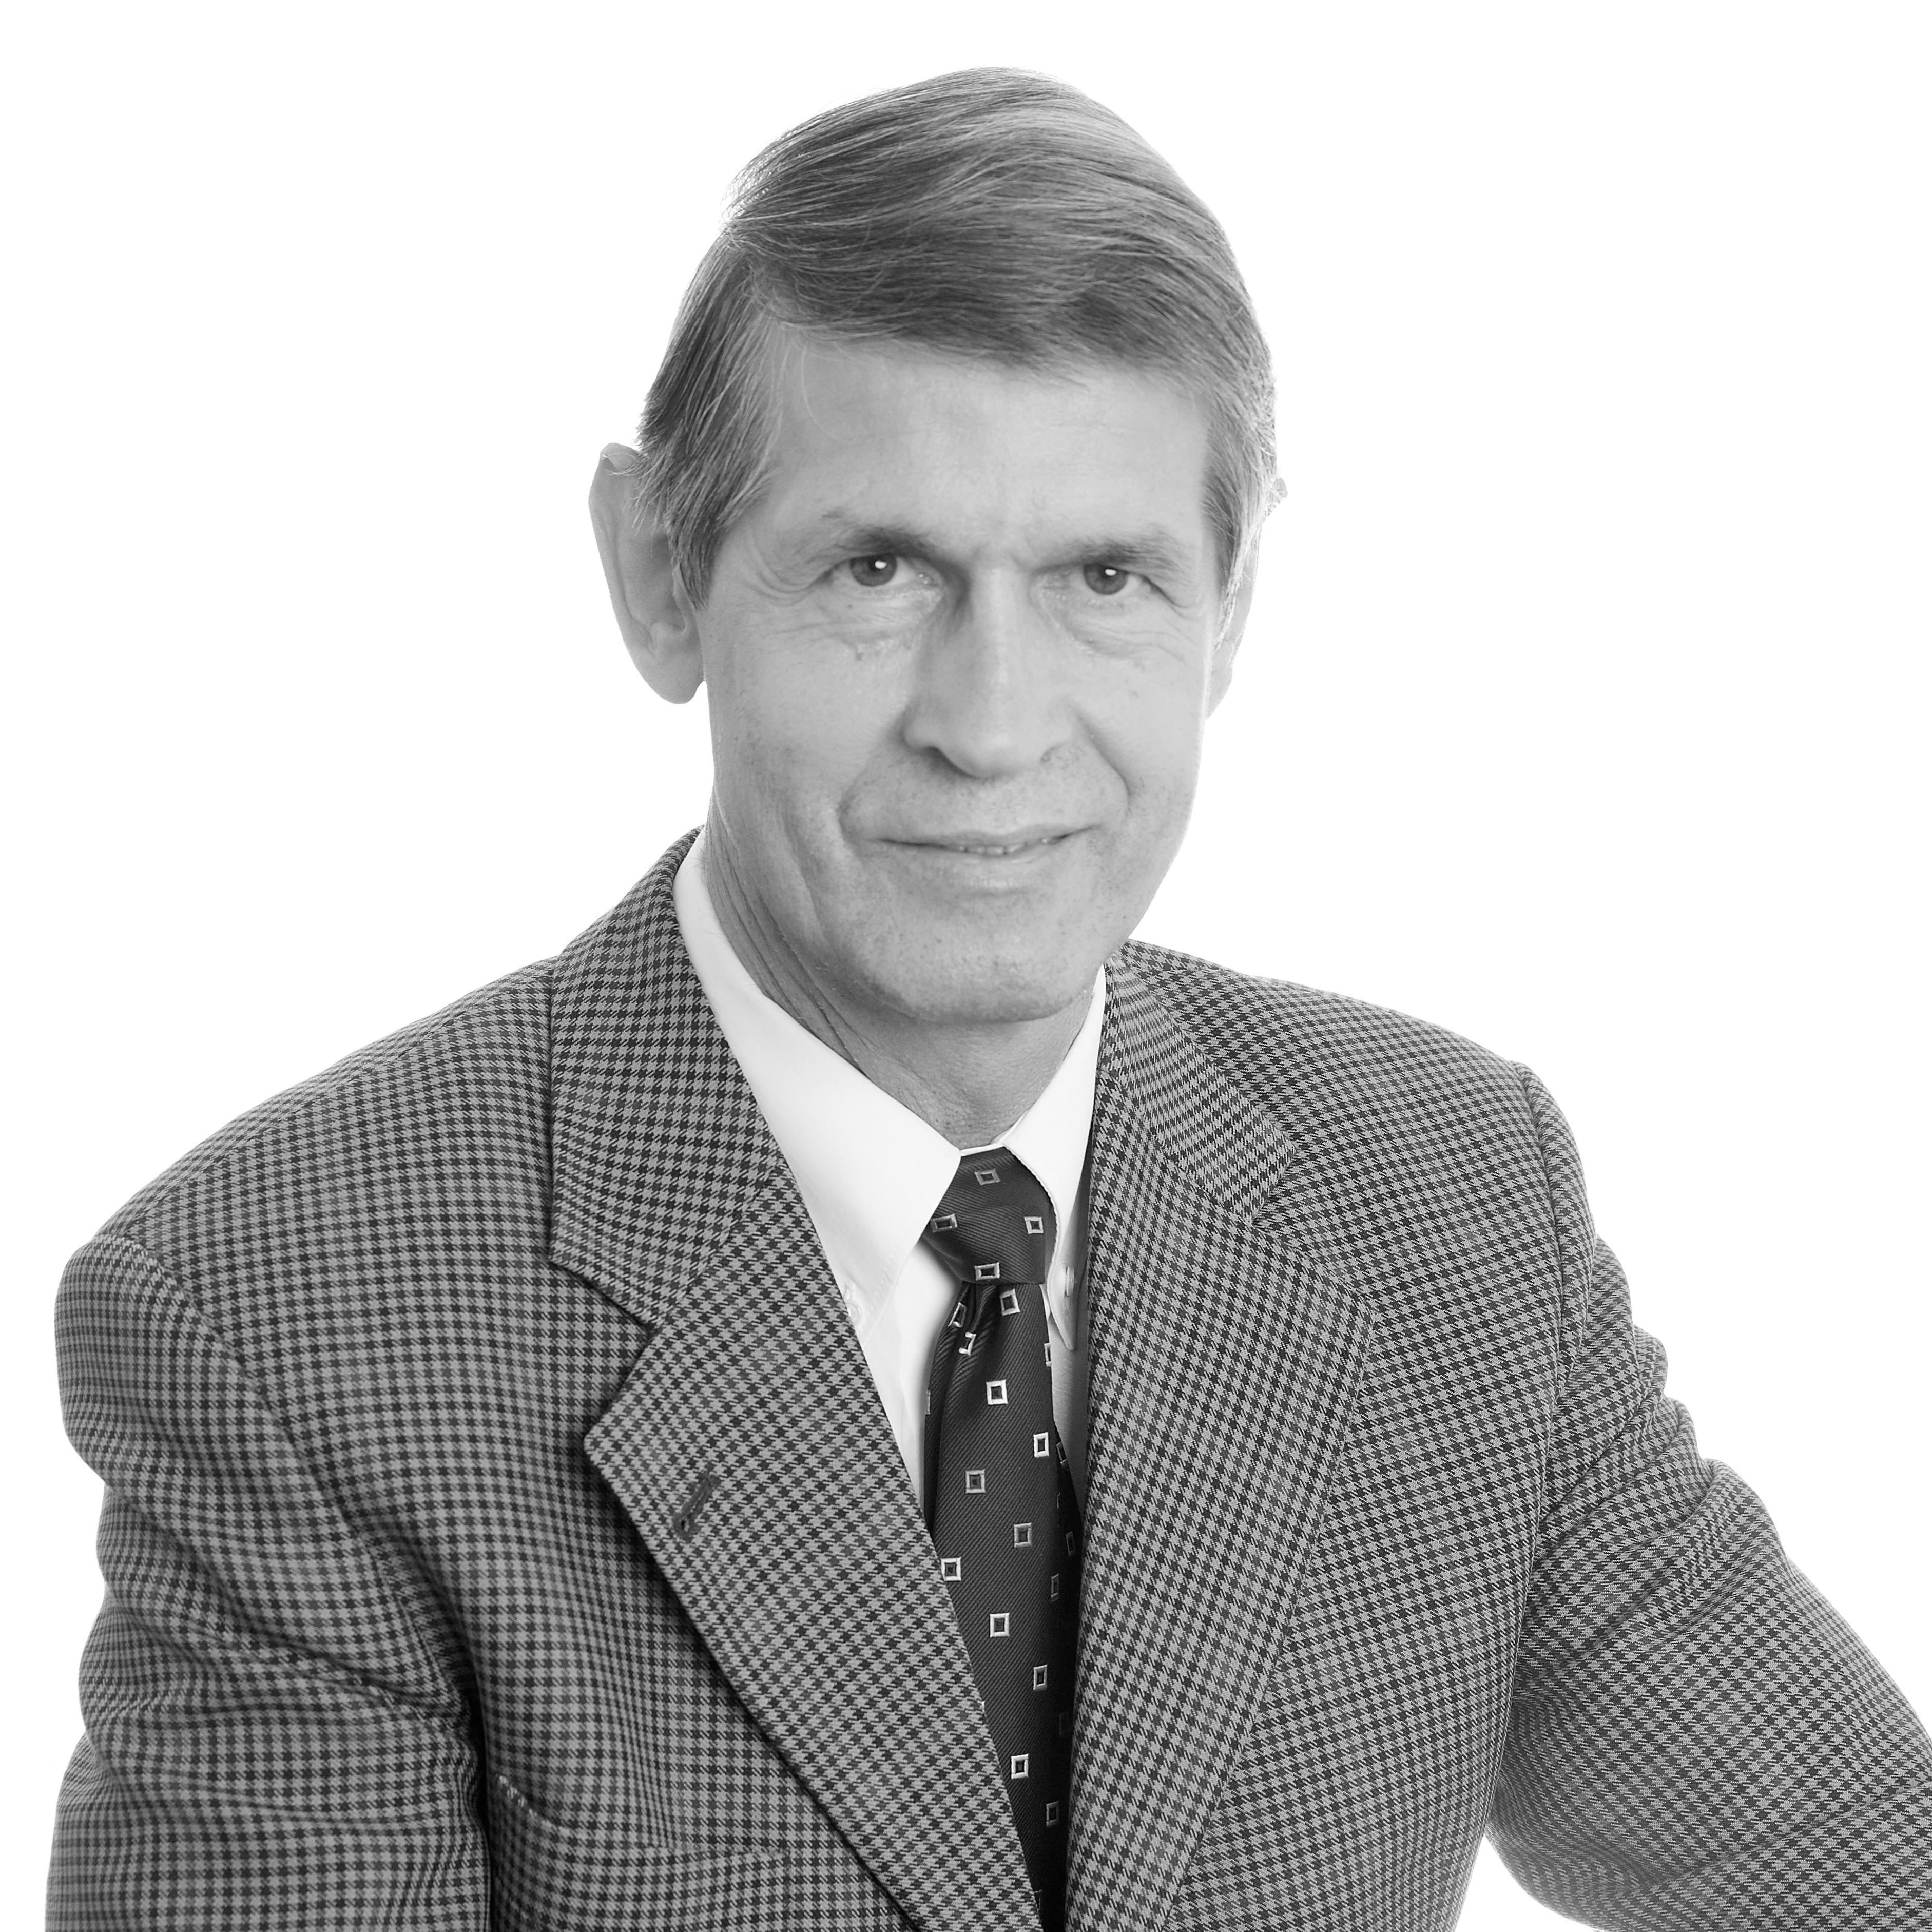 Reinhard Prahl - Raum Immobilien